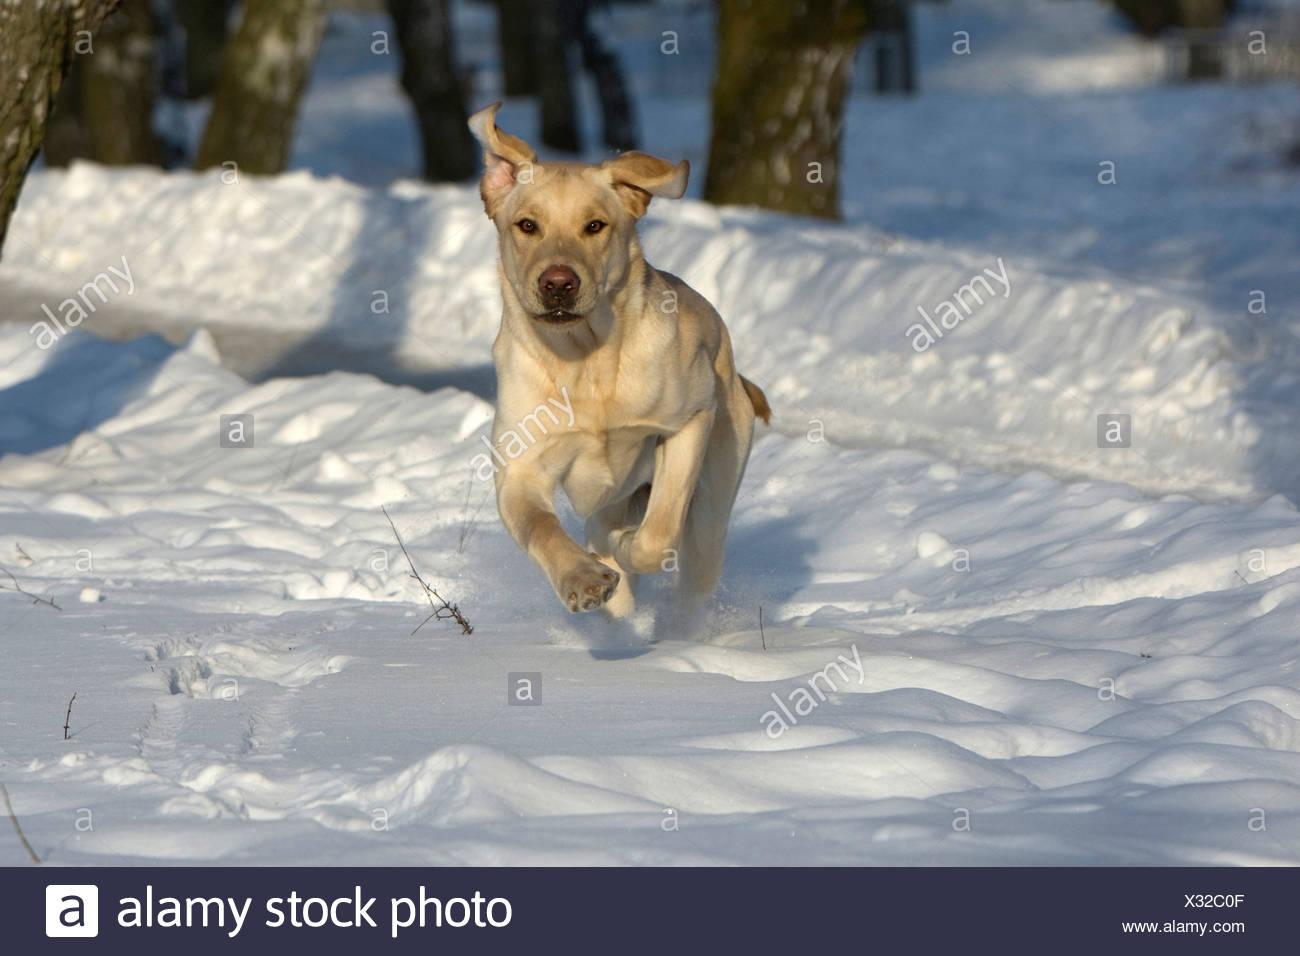 Labrador Retriever, Canis lupus familiaris, Feldberg, Feldberger Seenlandschaft, Mecklenburg-Vorpommern, Germany - Stock Image